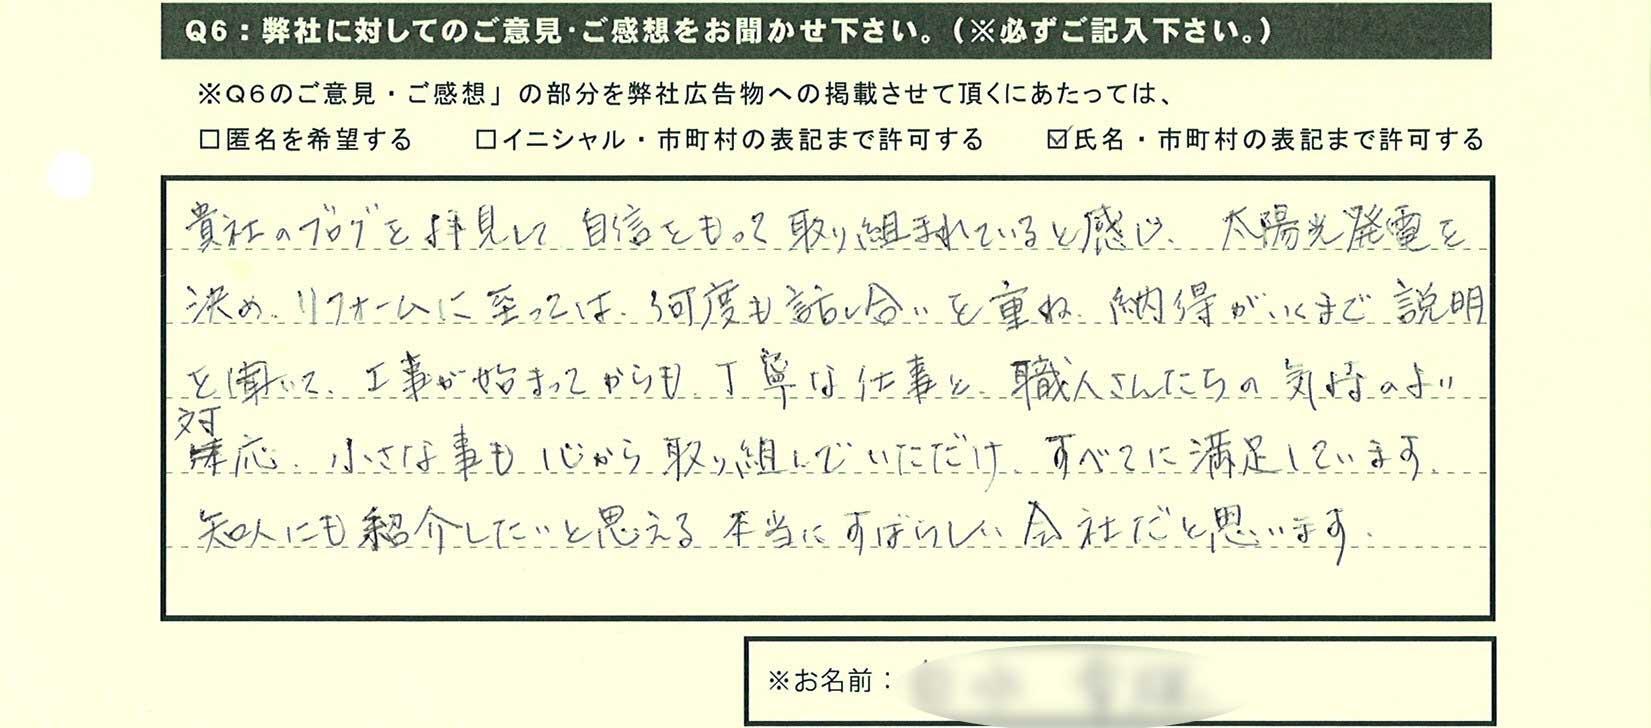 anke-sirouzu1.jpg